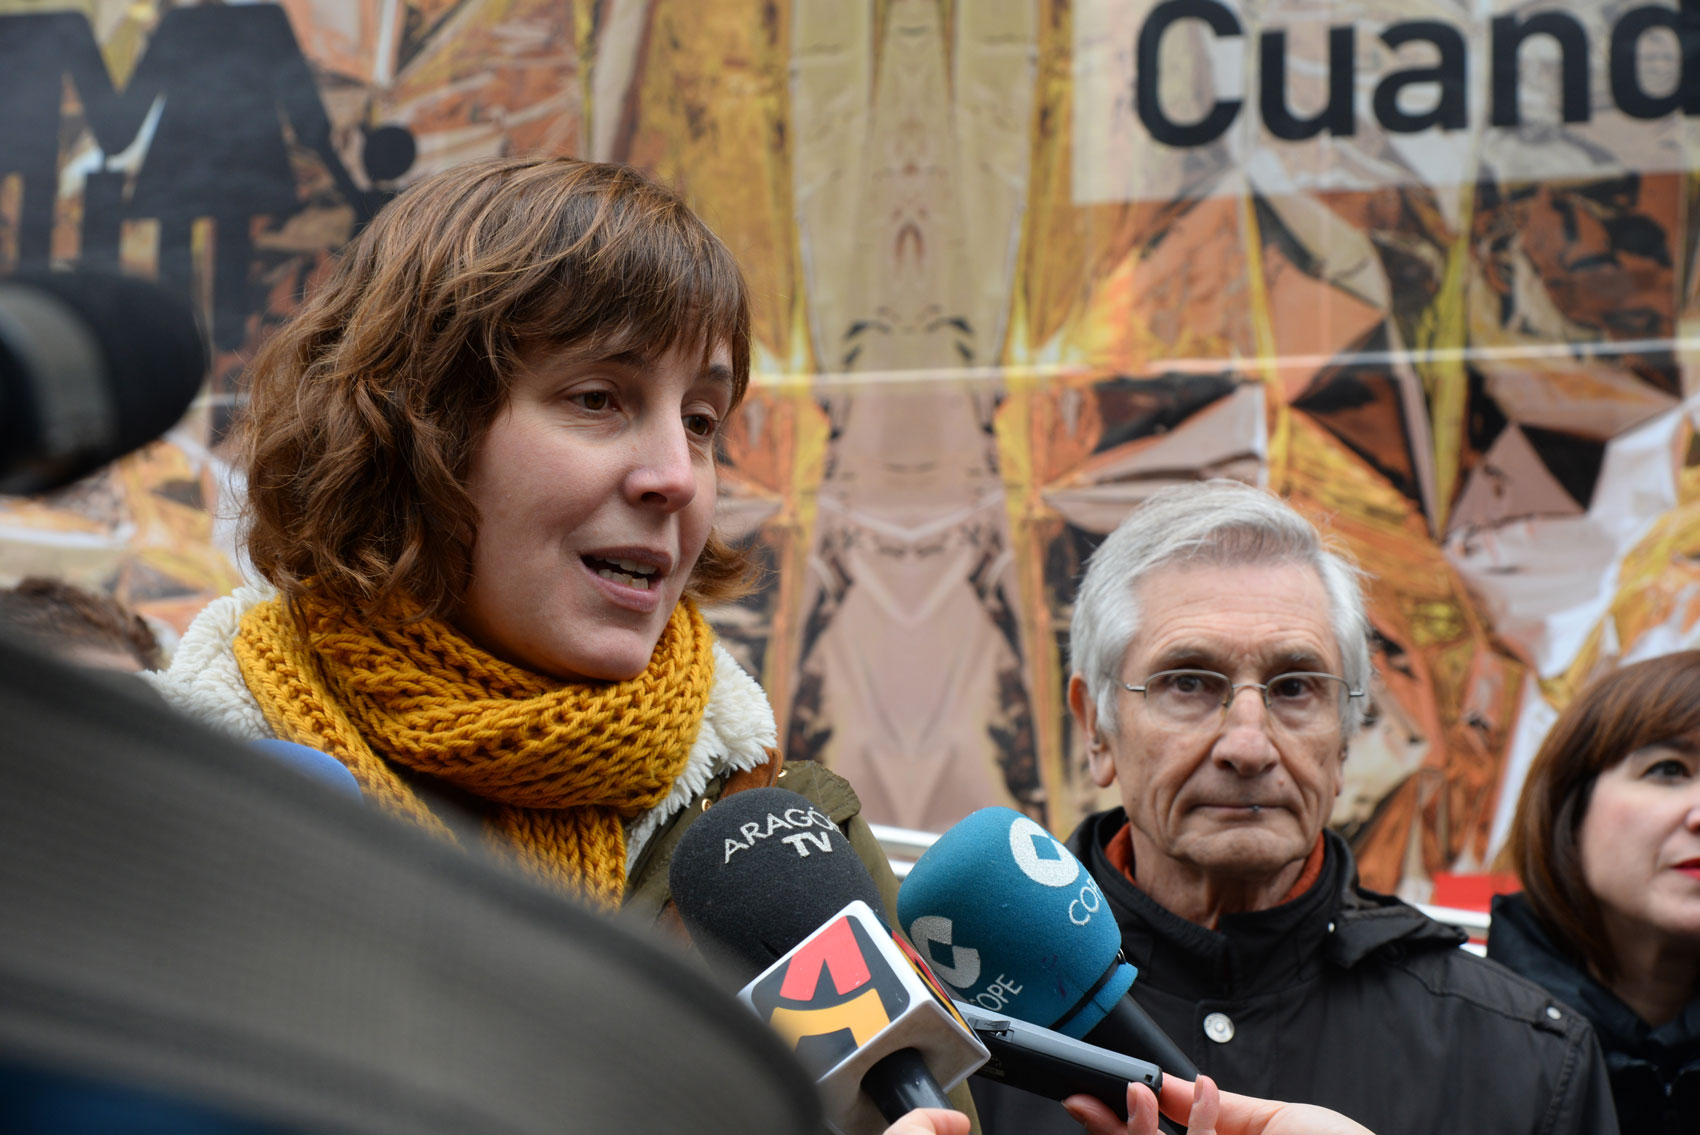 Teresa Artigas MIGRAR #EsUnDerecho